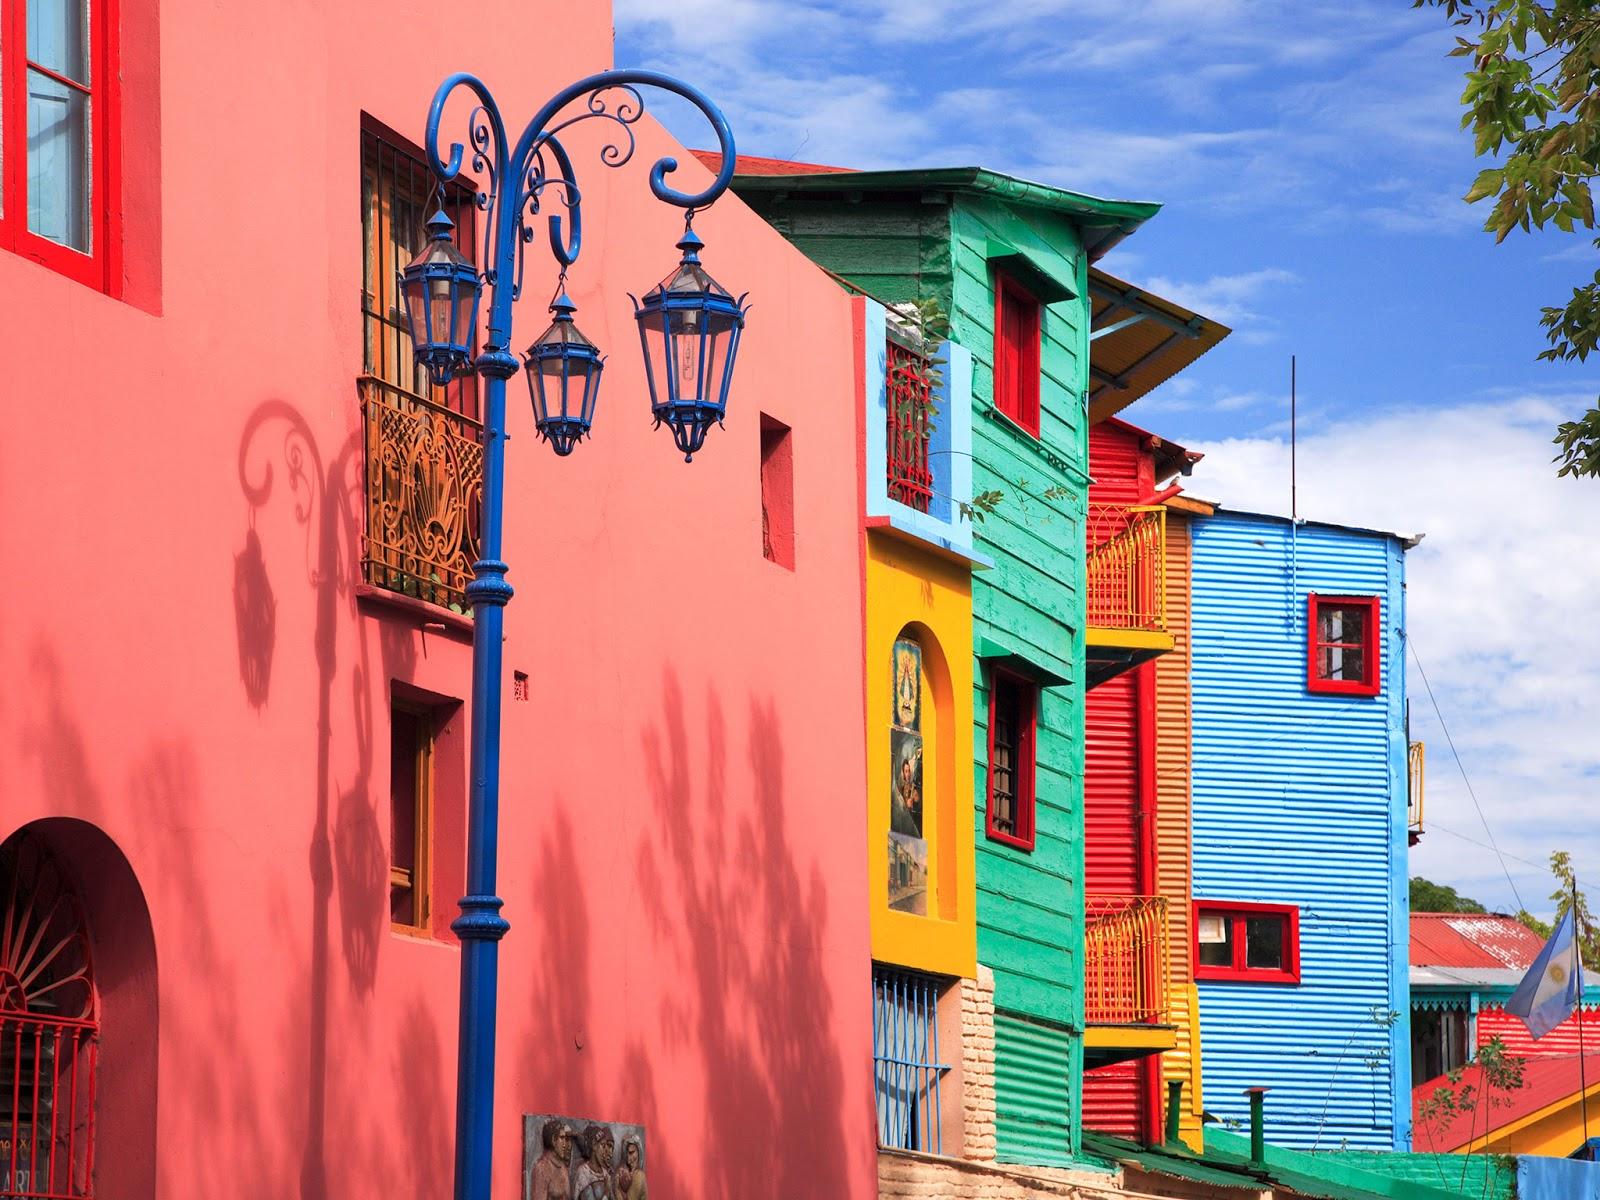 5-five-5: La Boca (Buenos Aires - Argentina)